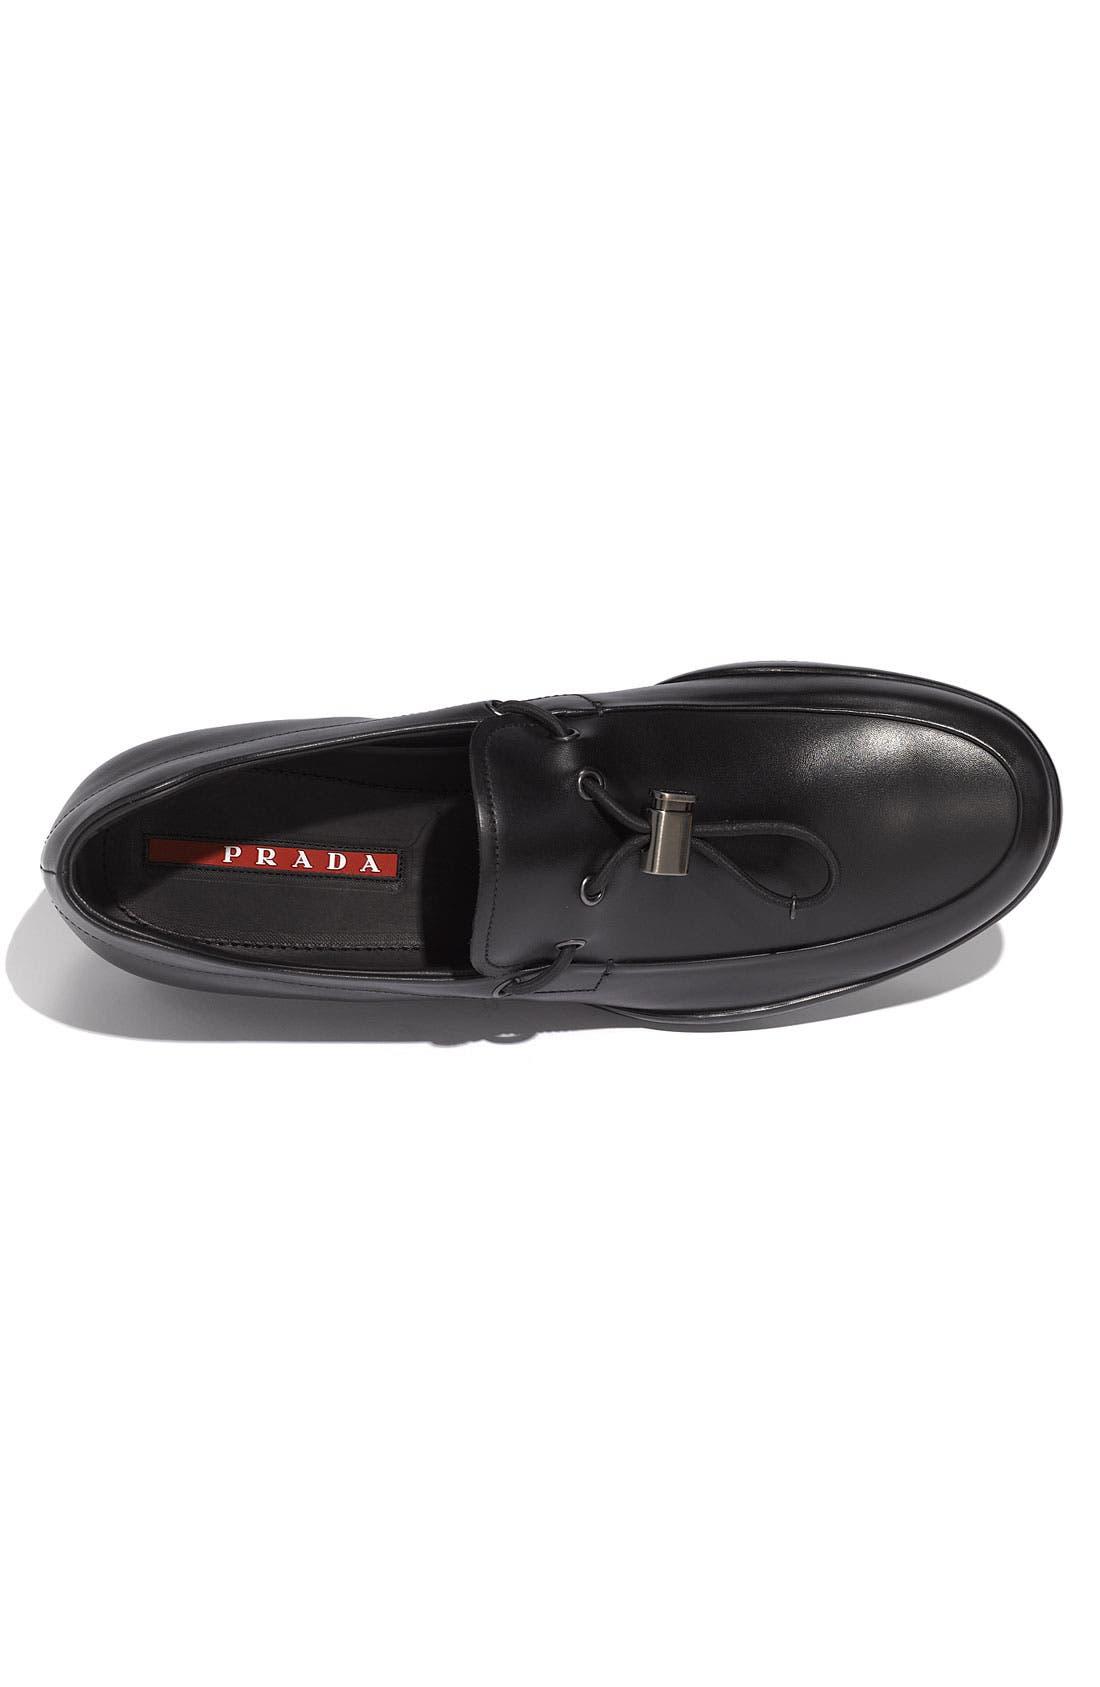 Alternate Image 3  - Prada Leather Loafer